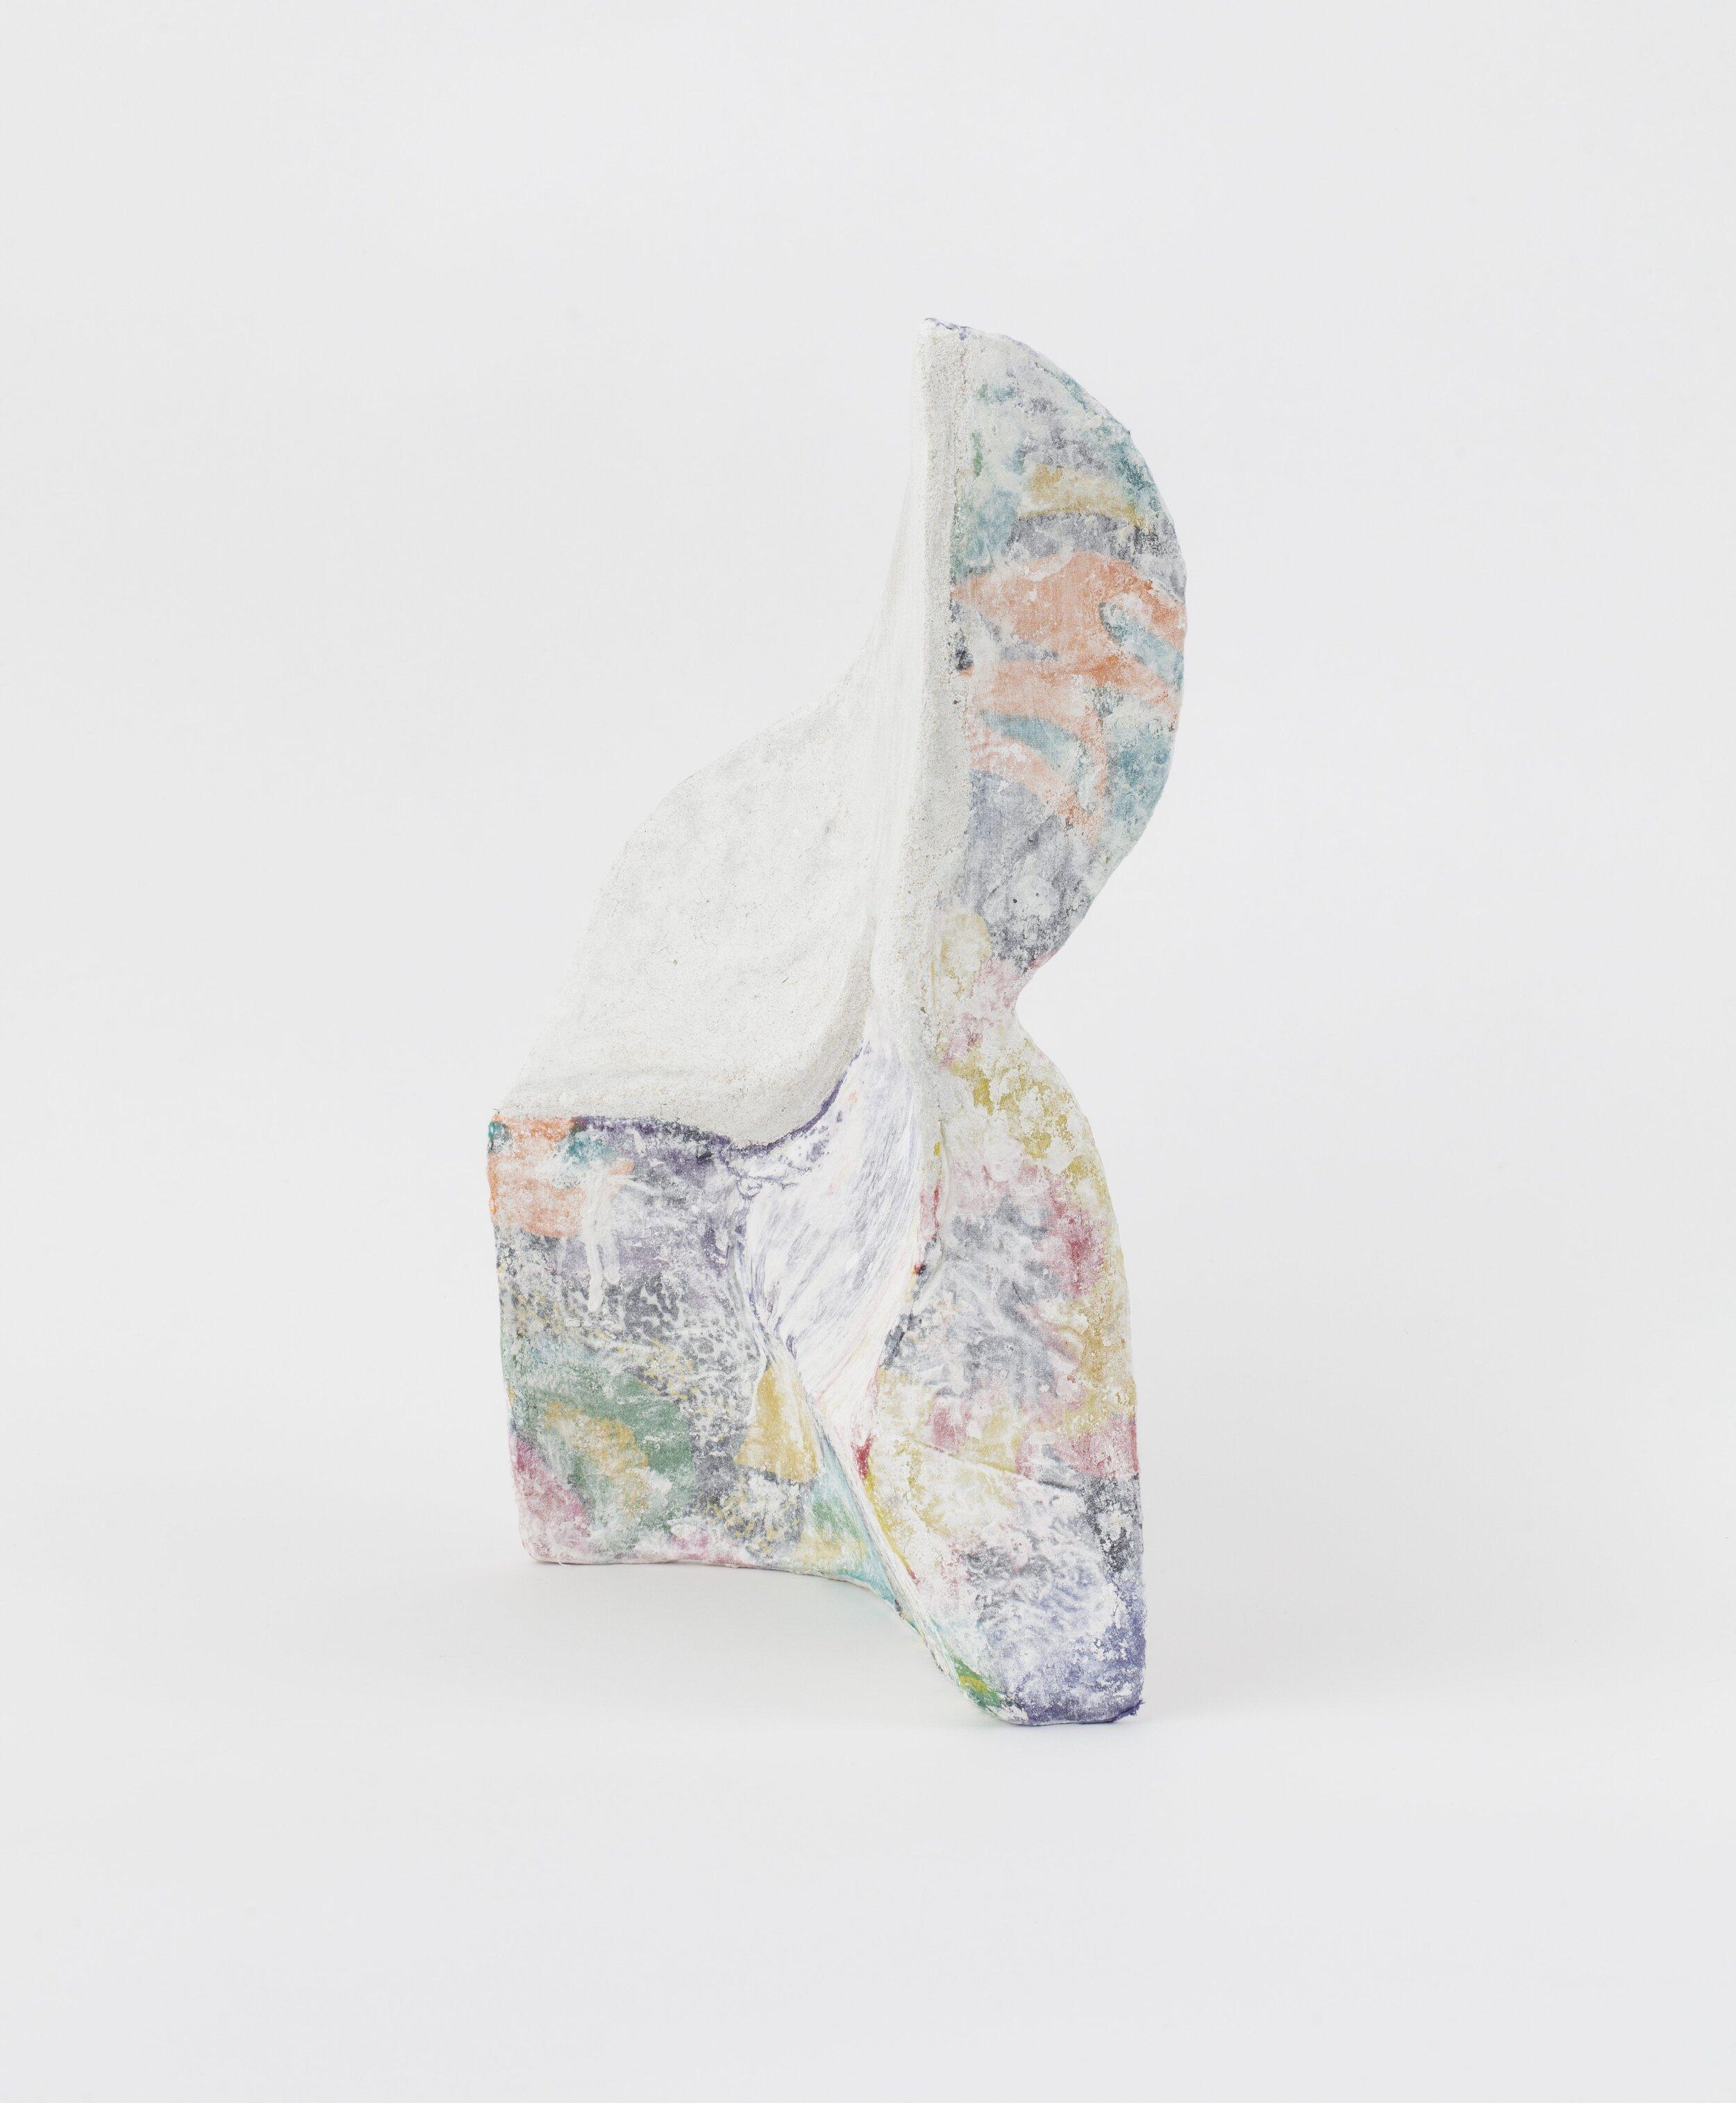 Jennifer Paige Cohen,    Painted Fern,  2019. Skirt, plaster, lime plaster. 14 x 10 x 5.5 inches. 35.6 x 25.4 x 14 cm.